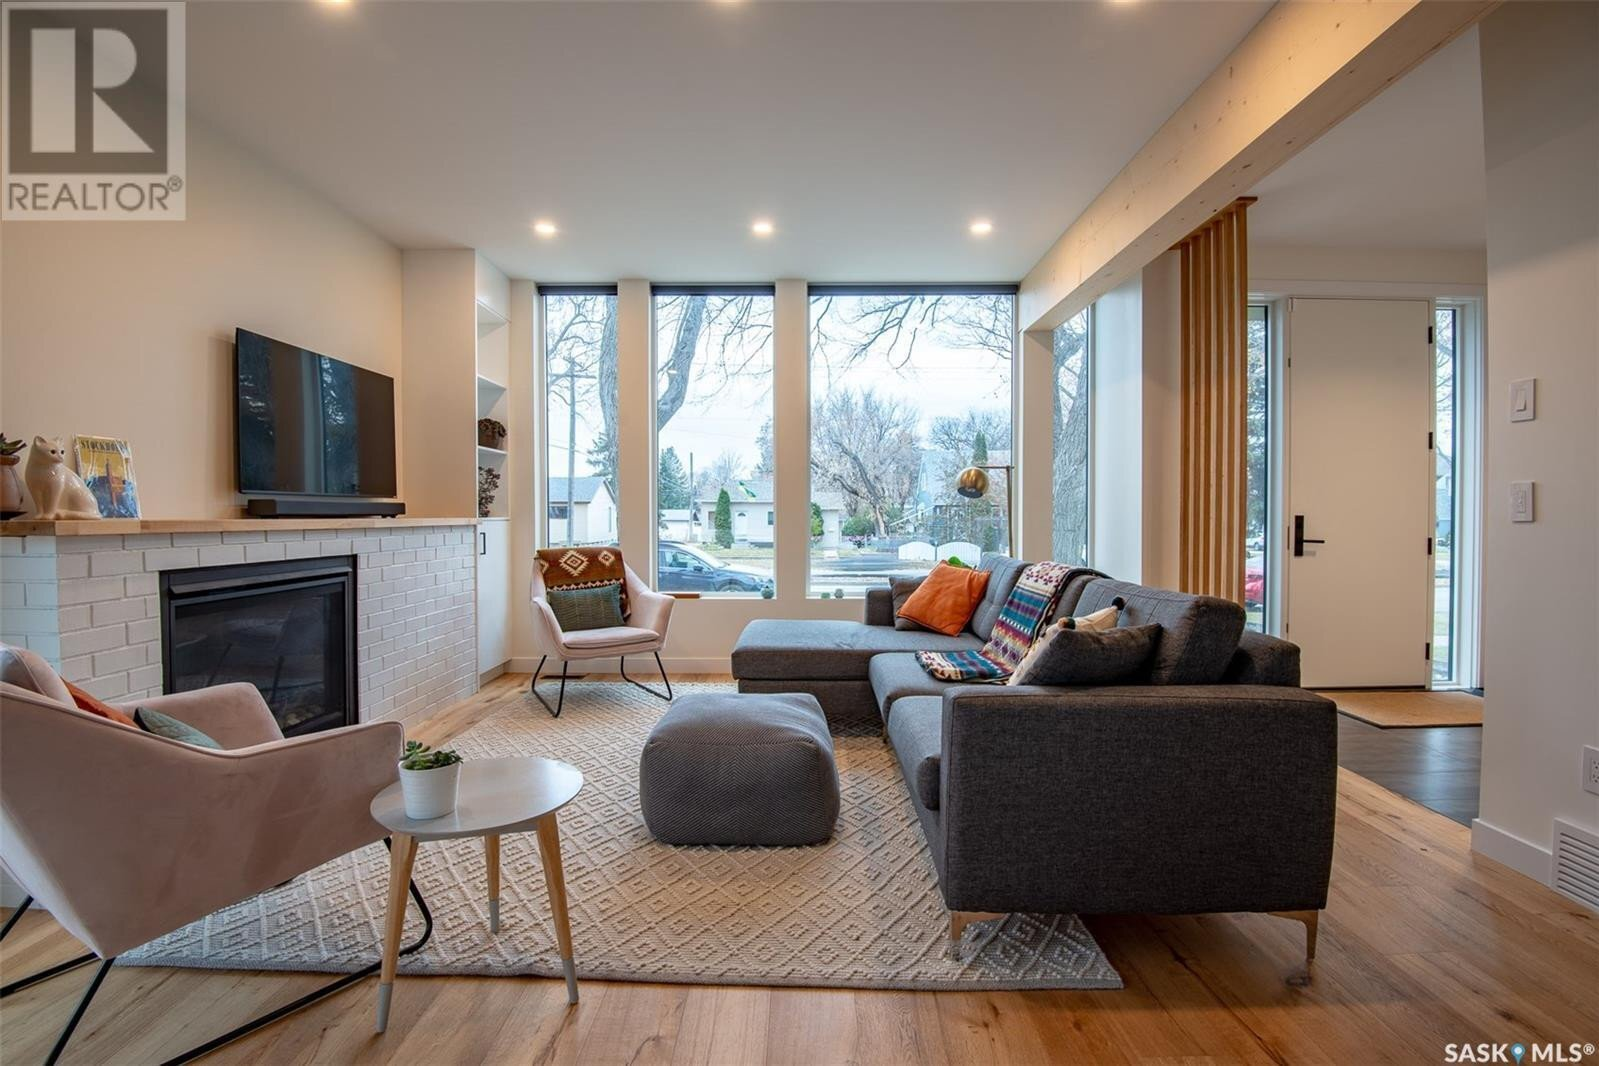 House for sale at 1127 13th St E Saskatoon Saskatchewan - MLS: SK839255